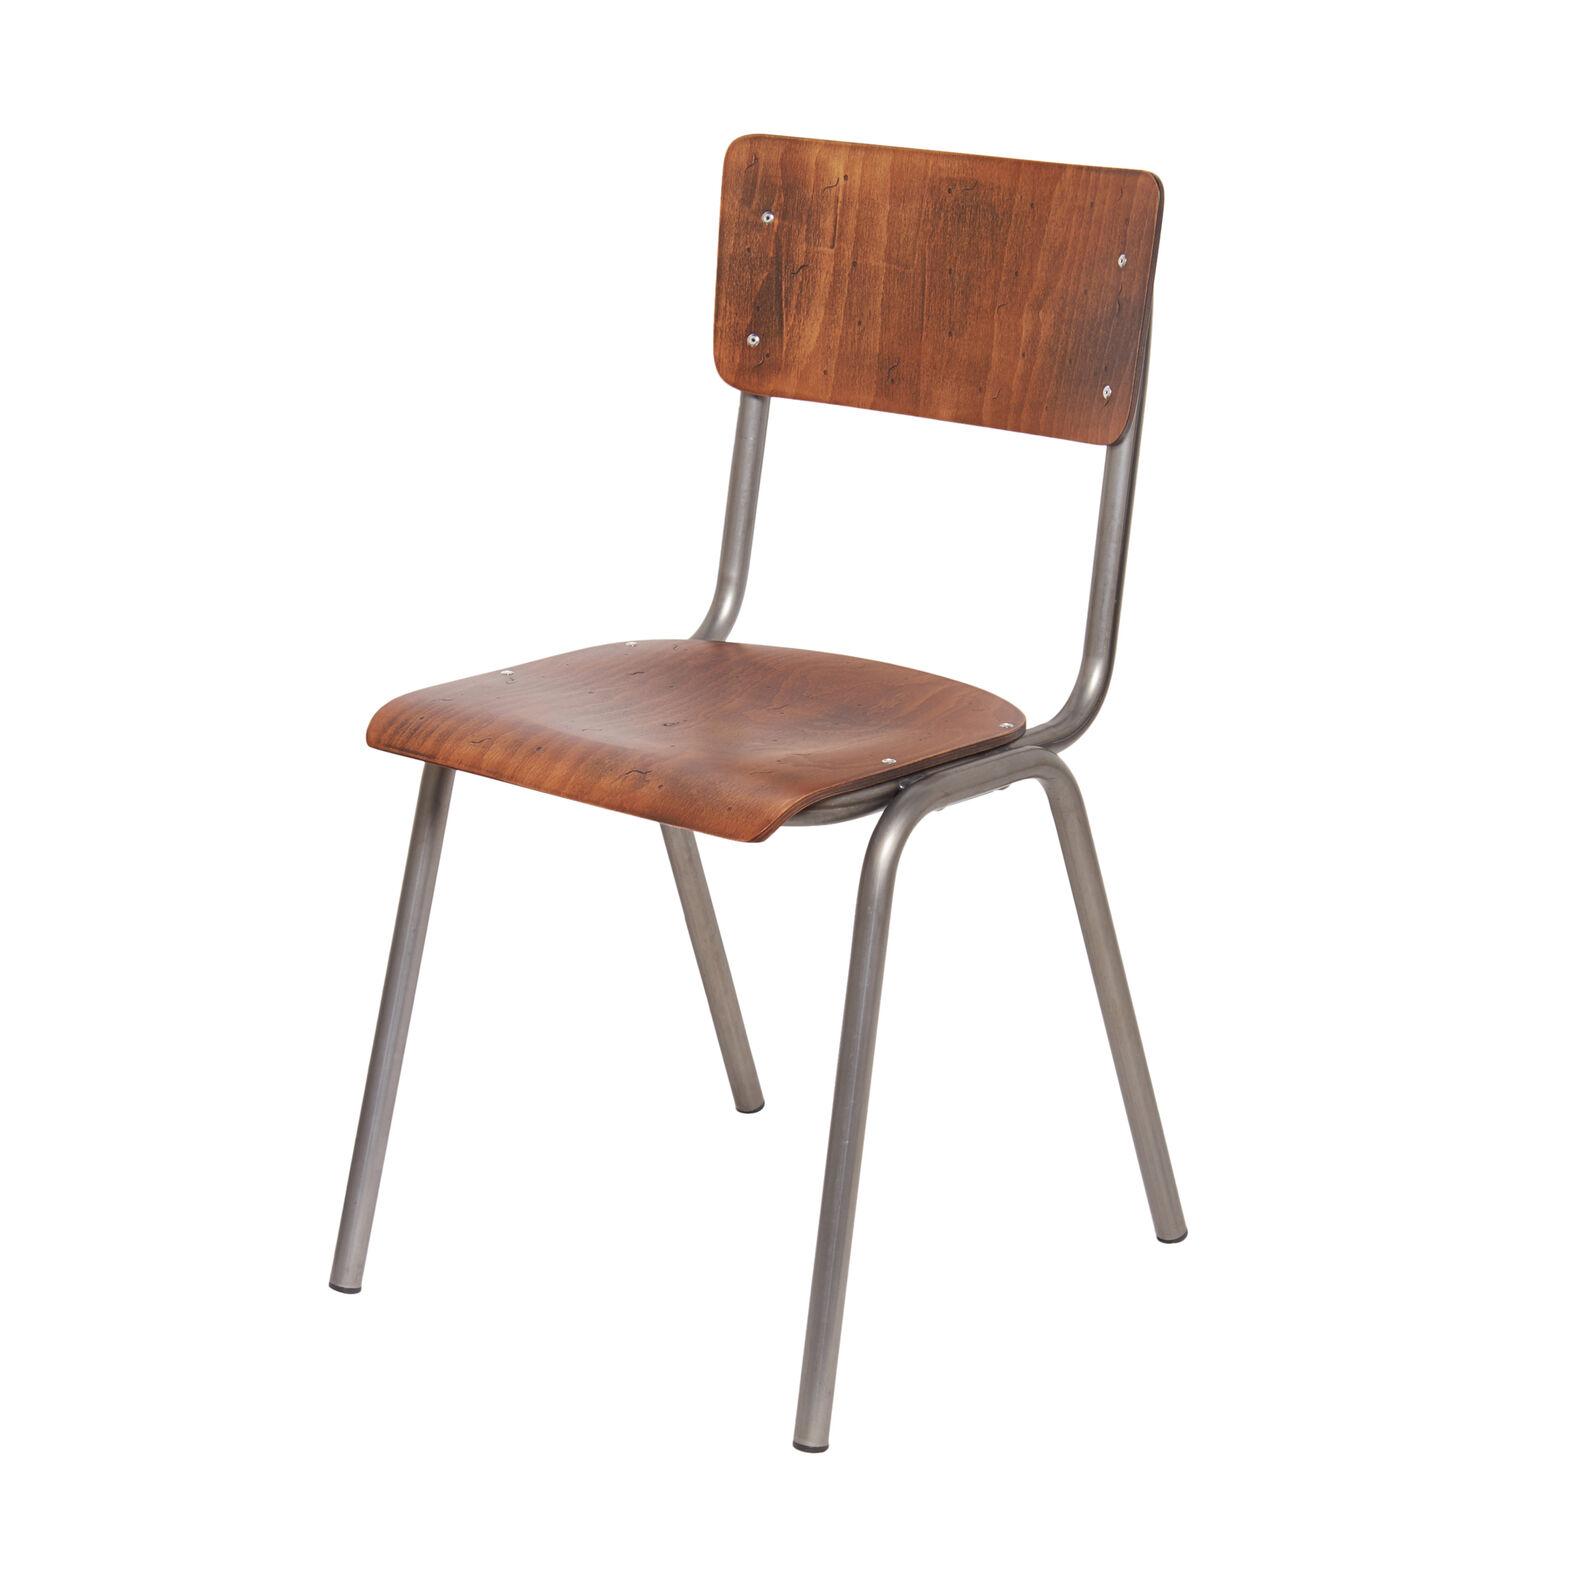 Cargo vintage Susy chair